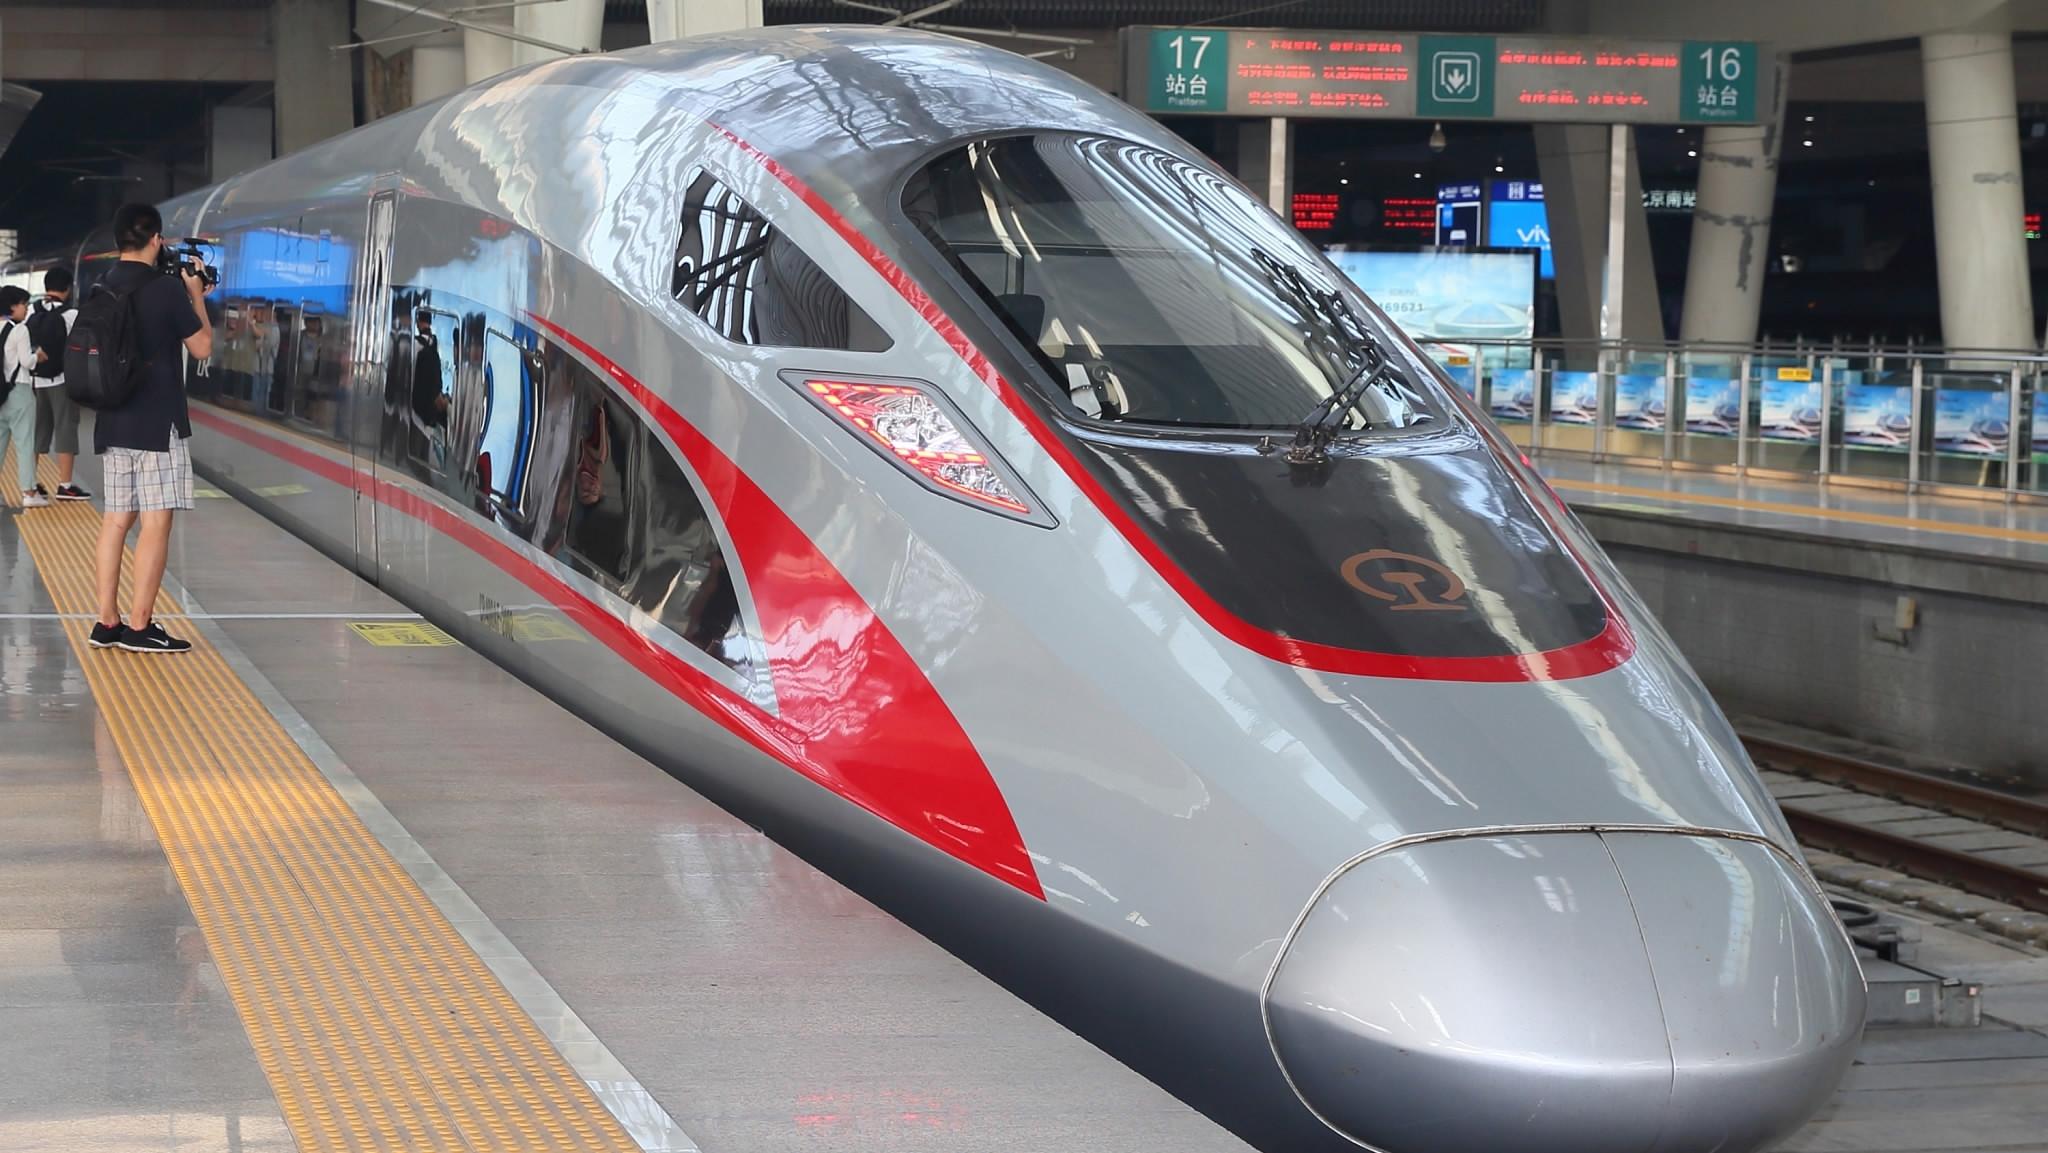 Northwest Chinese city opens high-speed rail